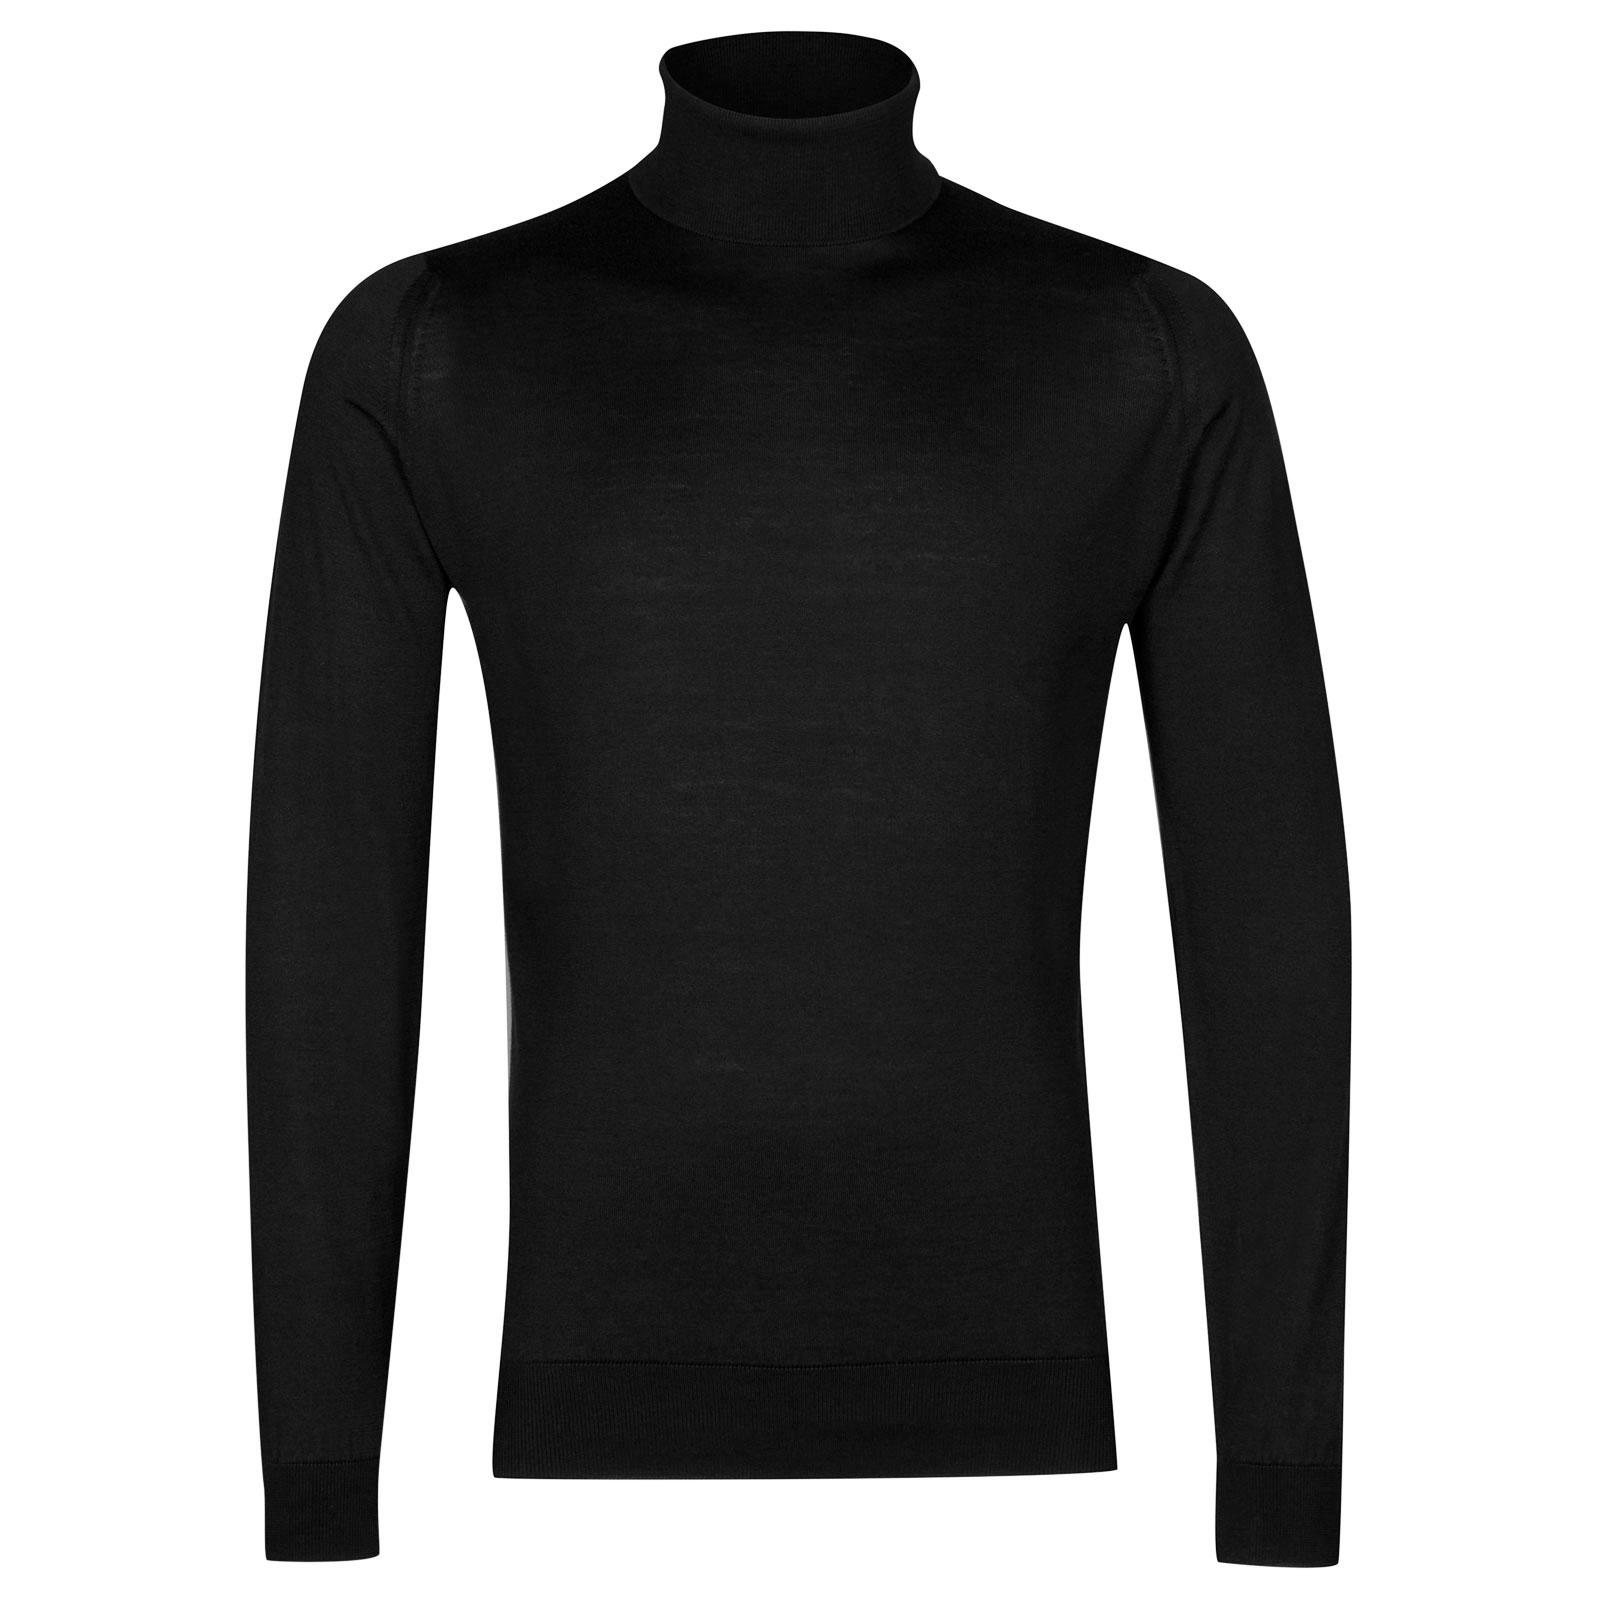 John Smedley Hawley Sea Island Cotton Pullover in Black-S